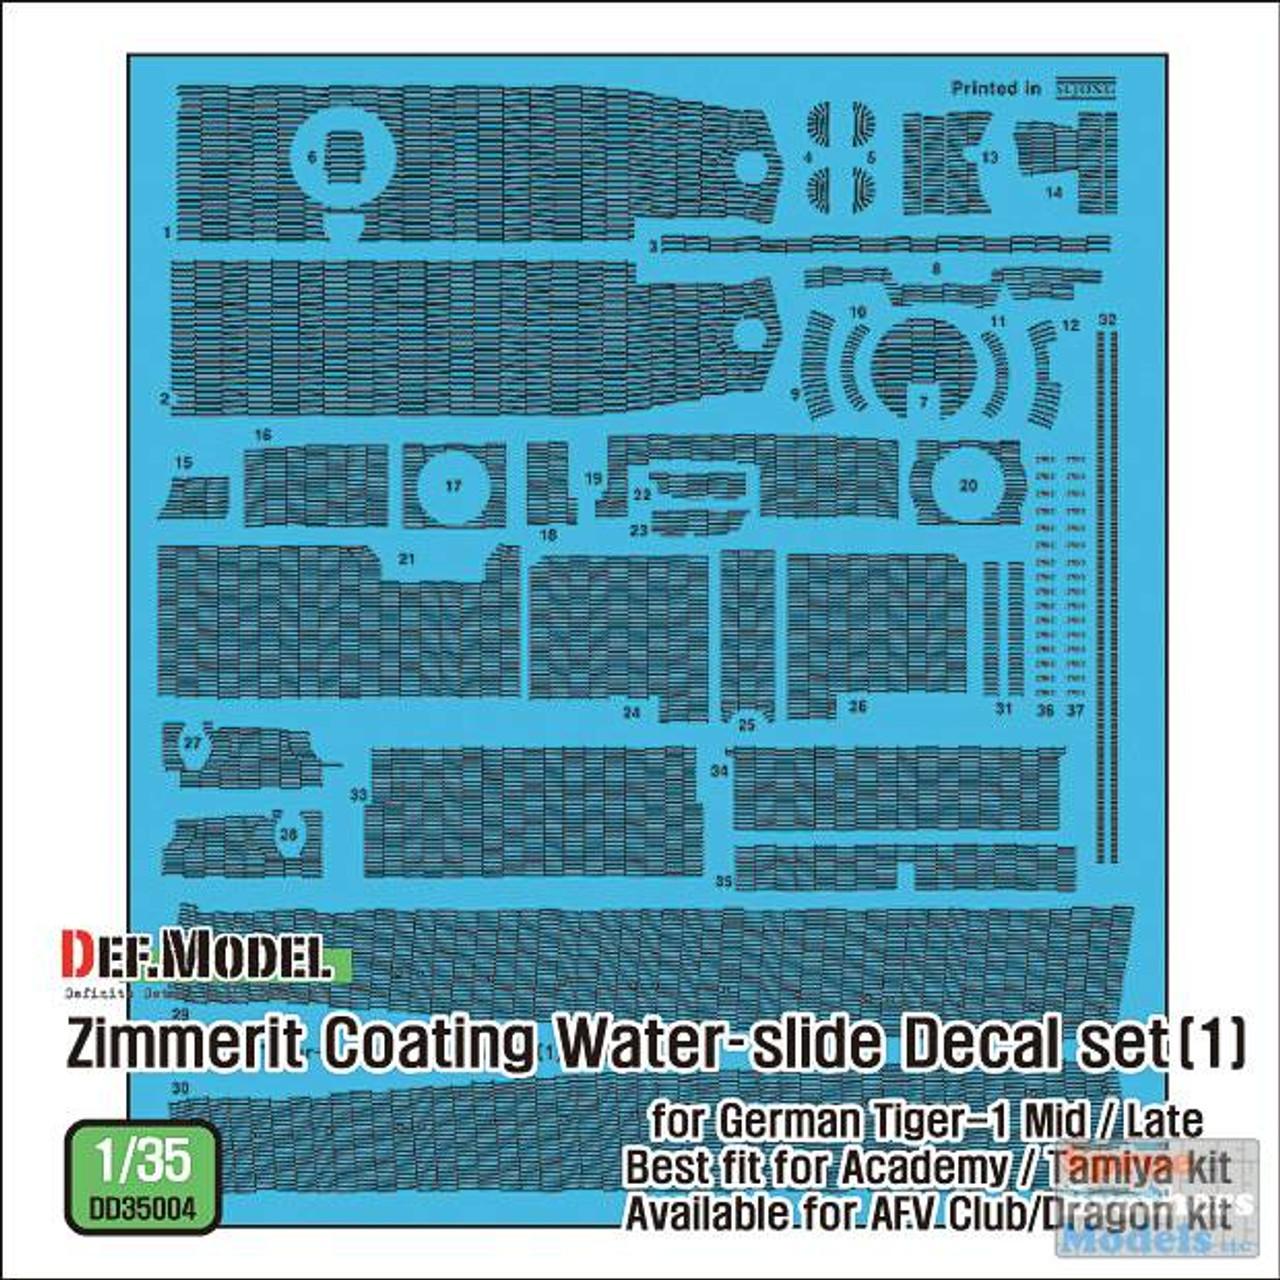 DEFDD35004 1:35 DEF Decal - Zimmerit Coating for Tiger I Mid/Late (ACA/TAM kit